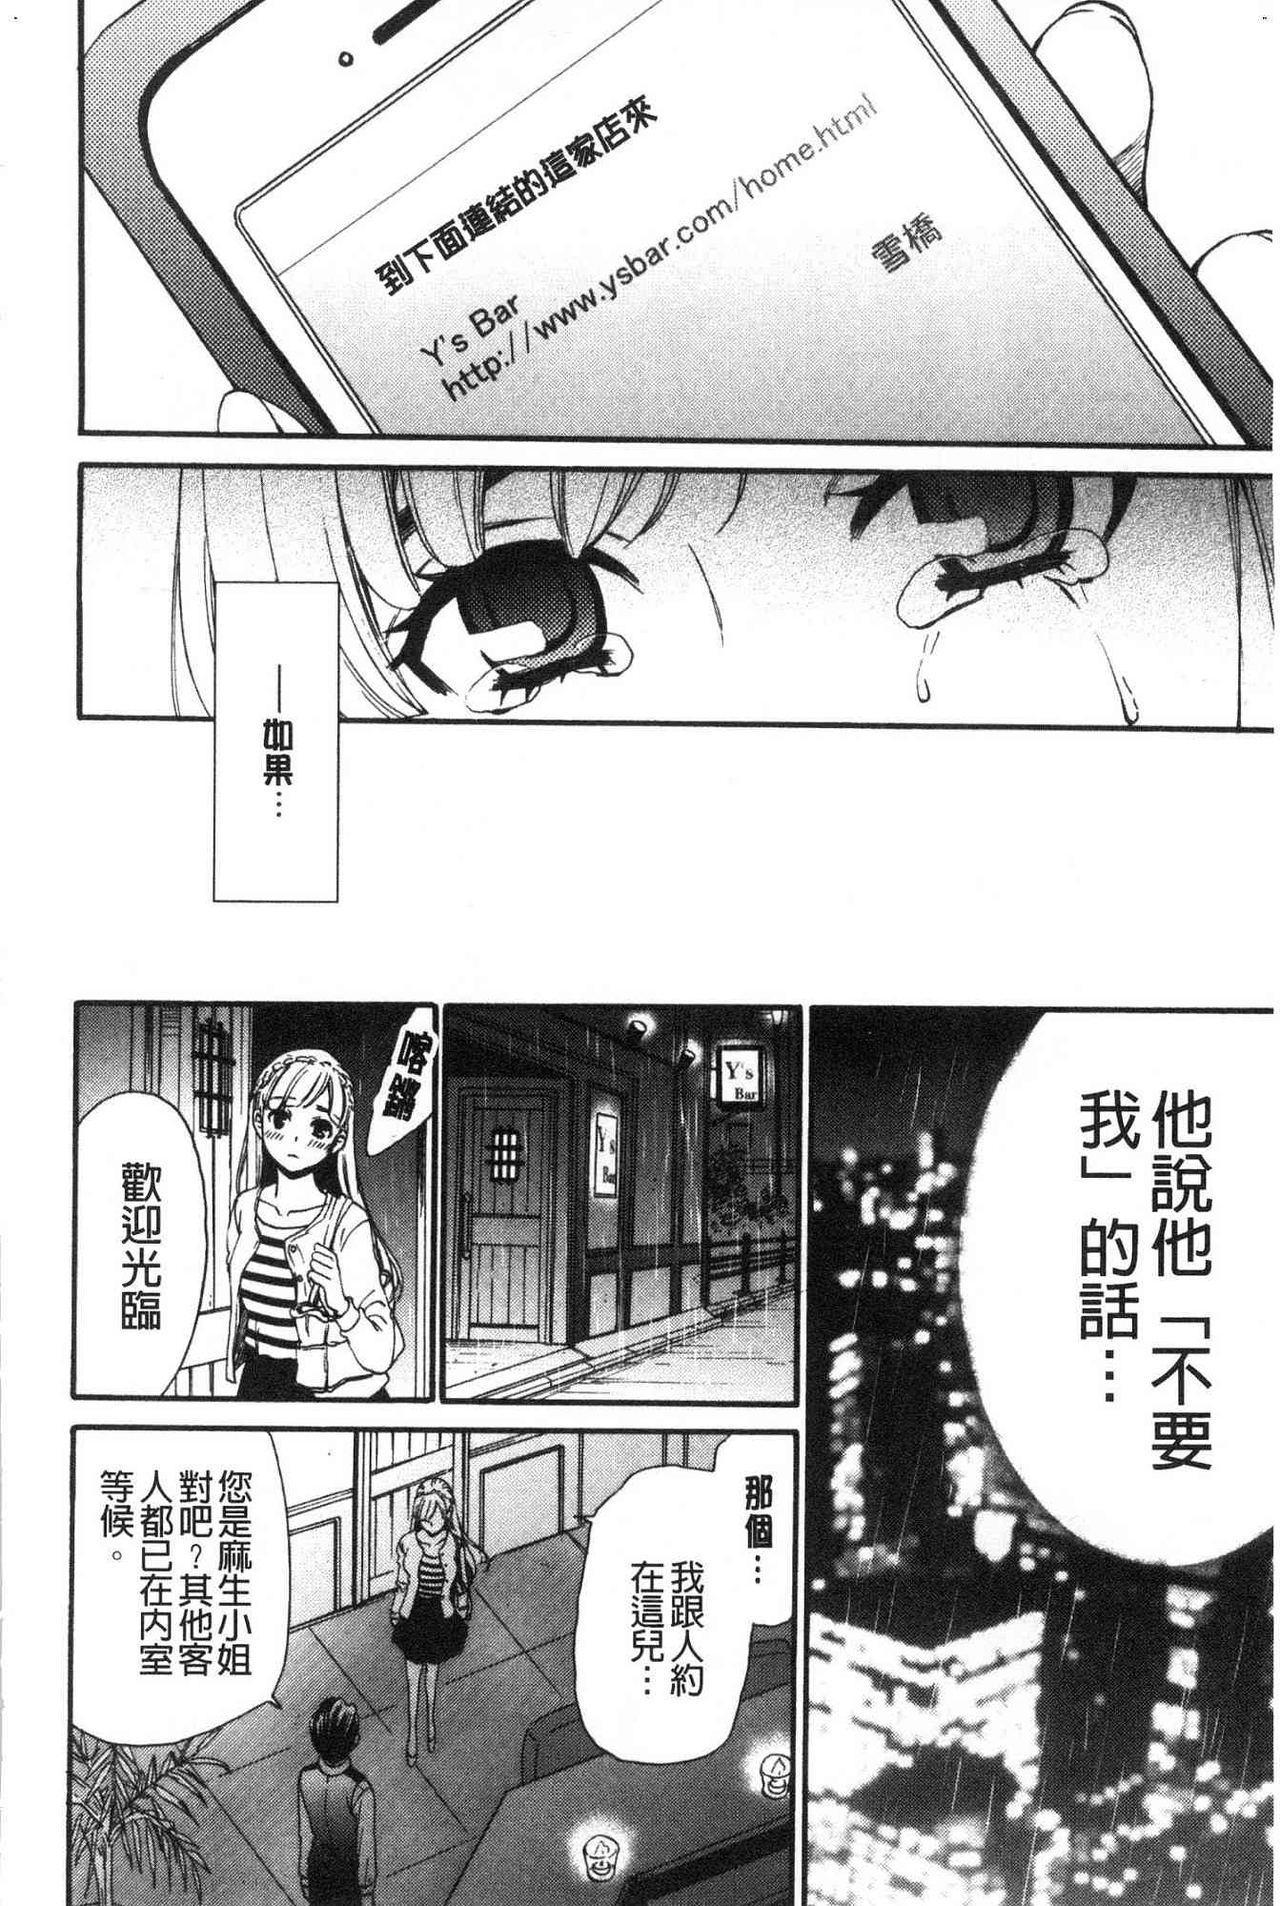 [Gotoh Akira]  21-ji no Onna ~Camera no Mae no Mesuinu~ 2 | 21時之女 ~鏡頭前的牝犬~ 2 [Chinese] 79